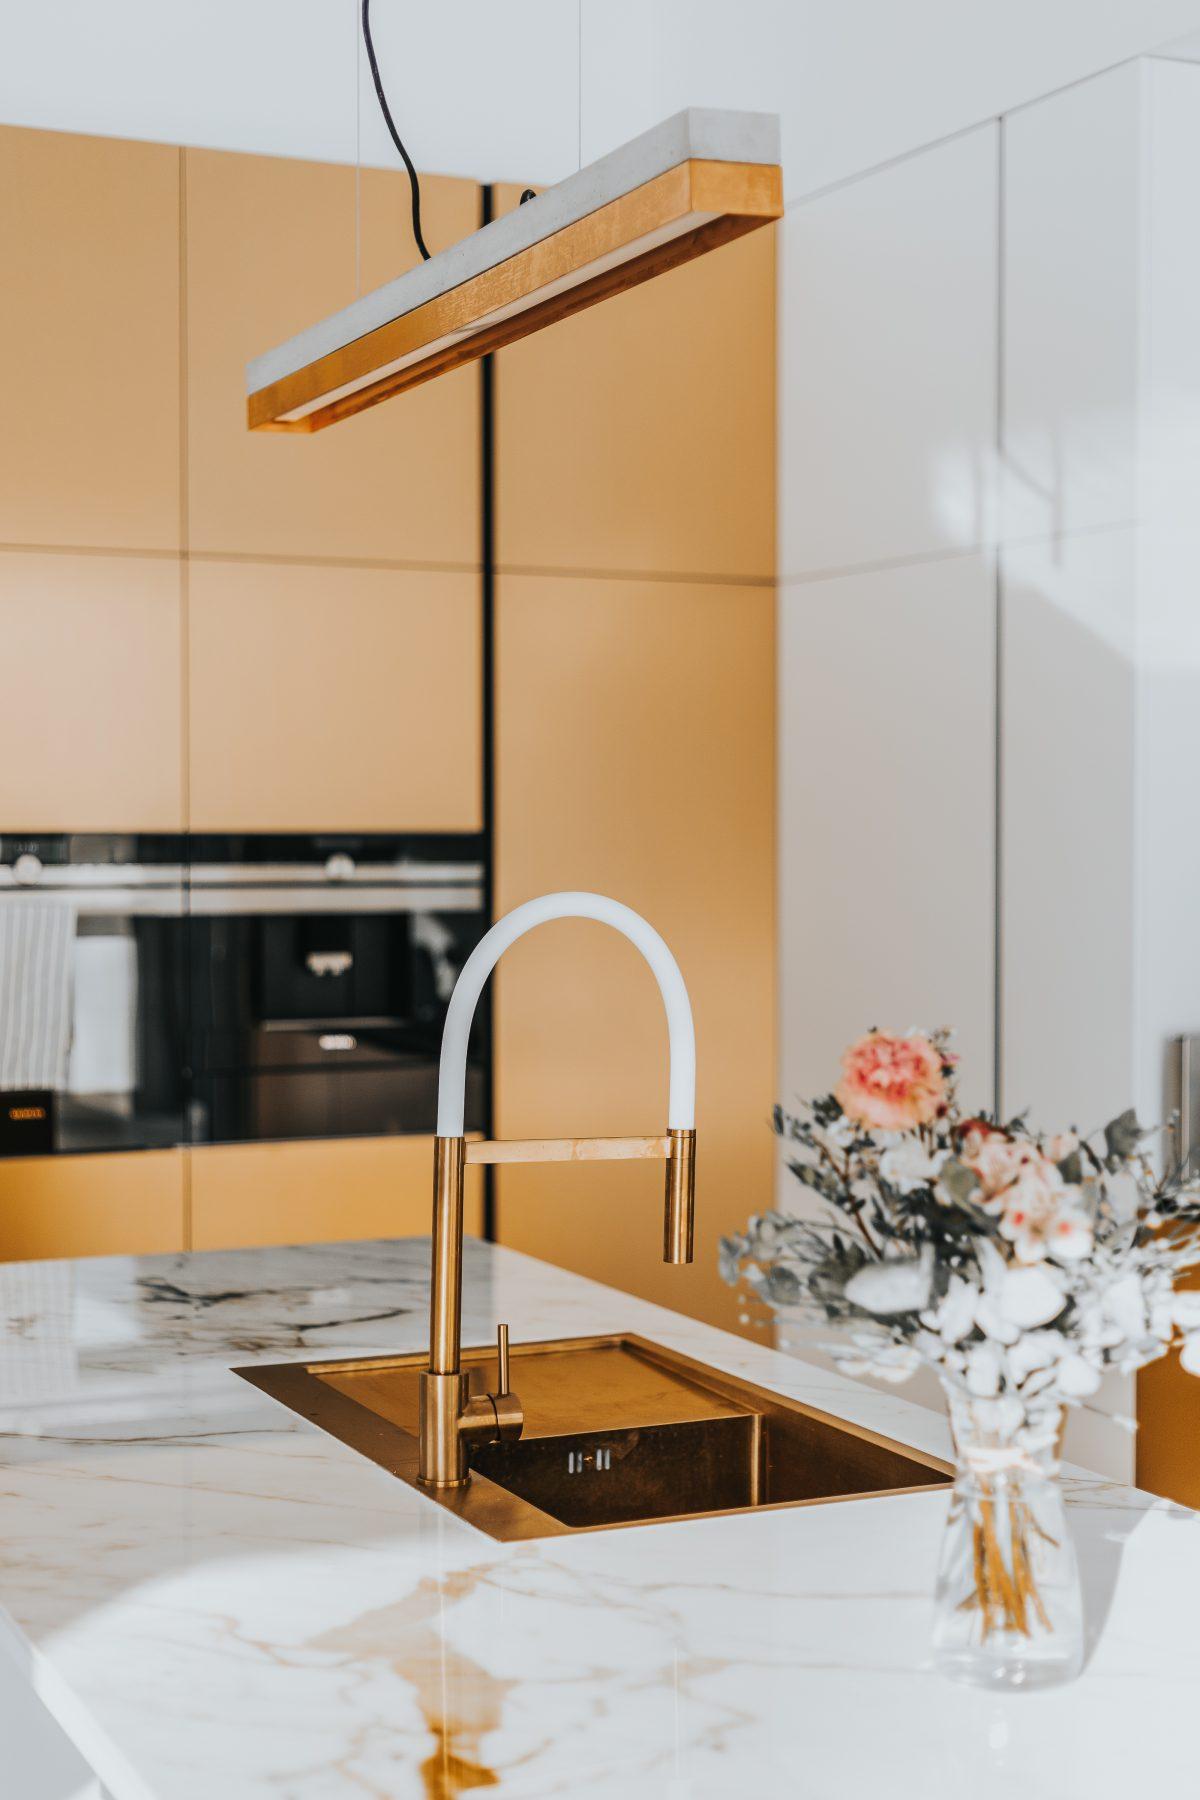 Industrial style kitchen 202